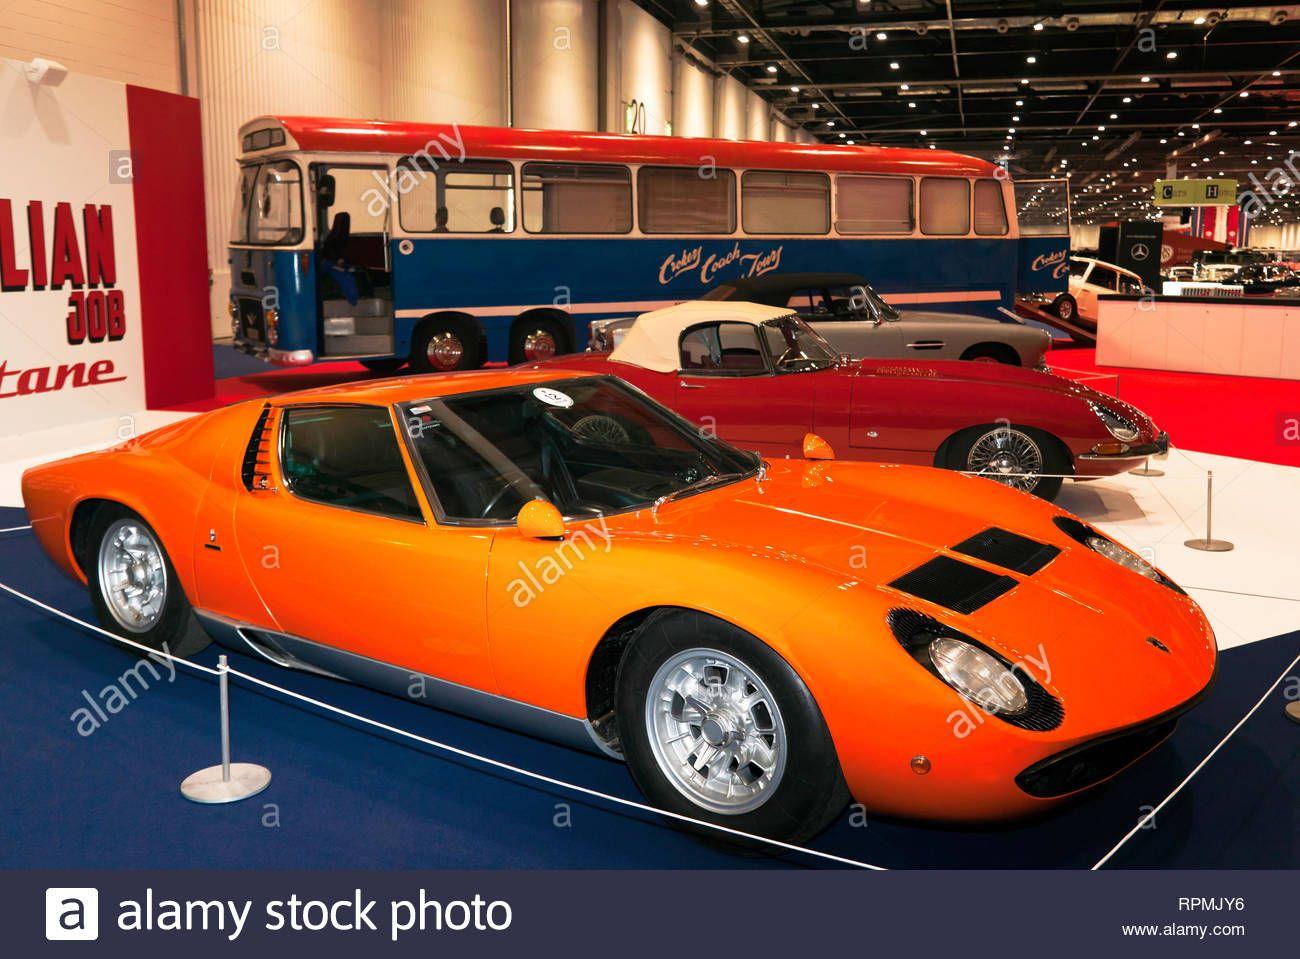 Download This Stock Image The Lamborghini Mura And Two Jaguar E